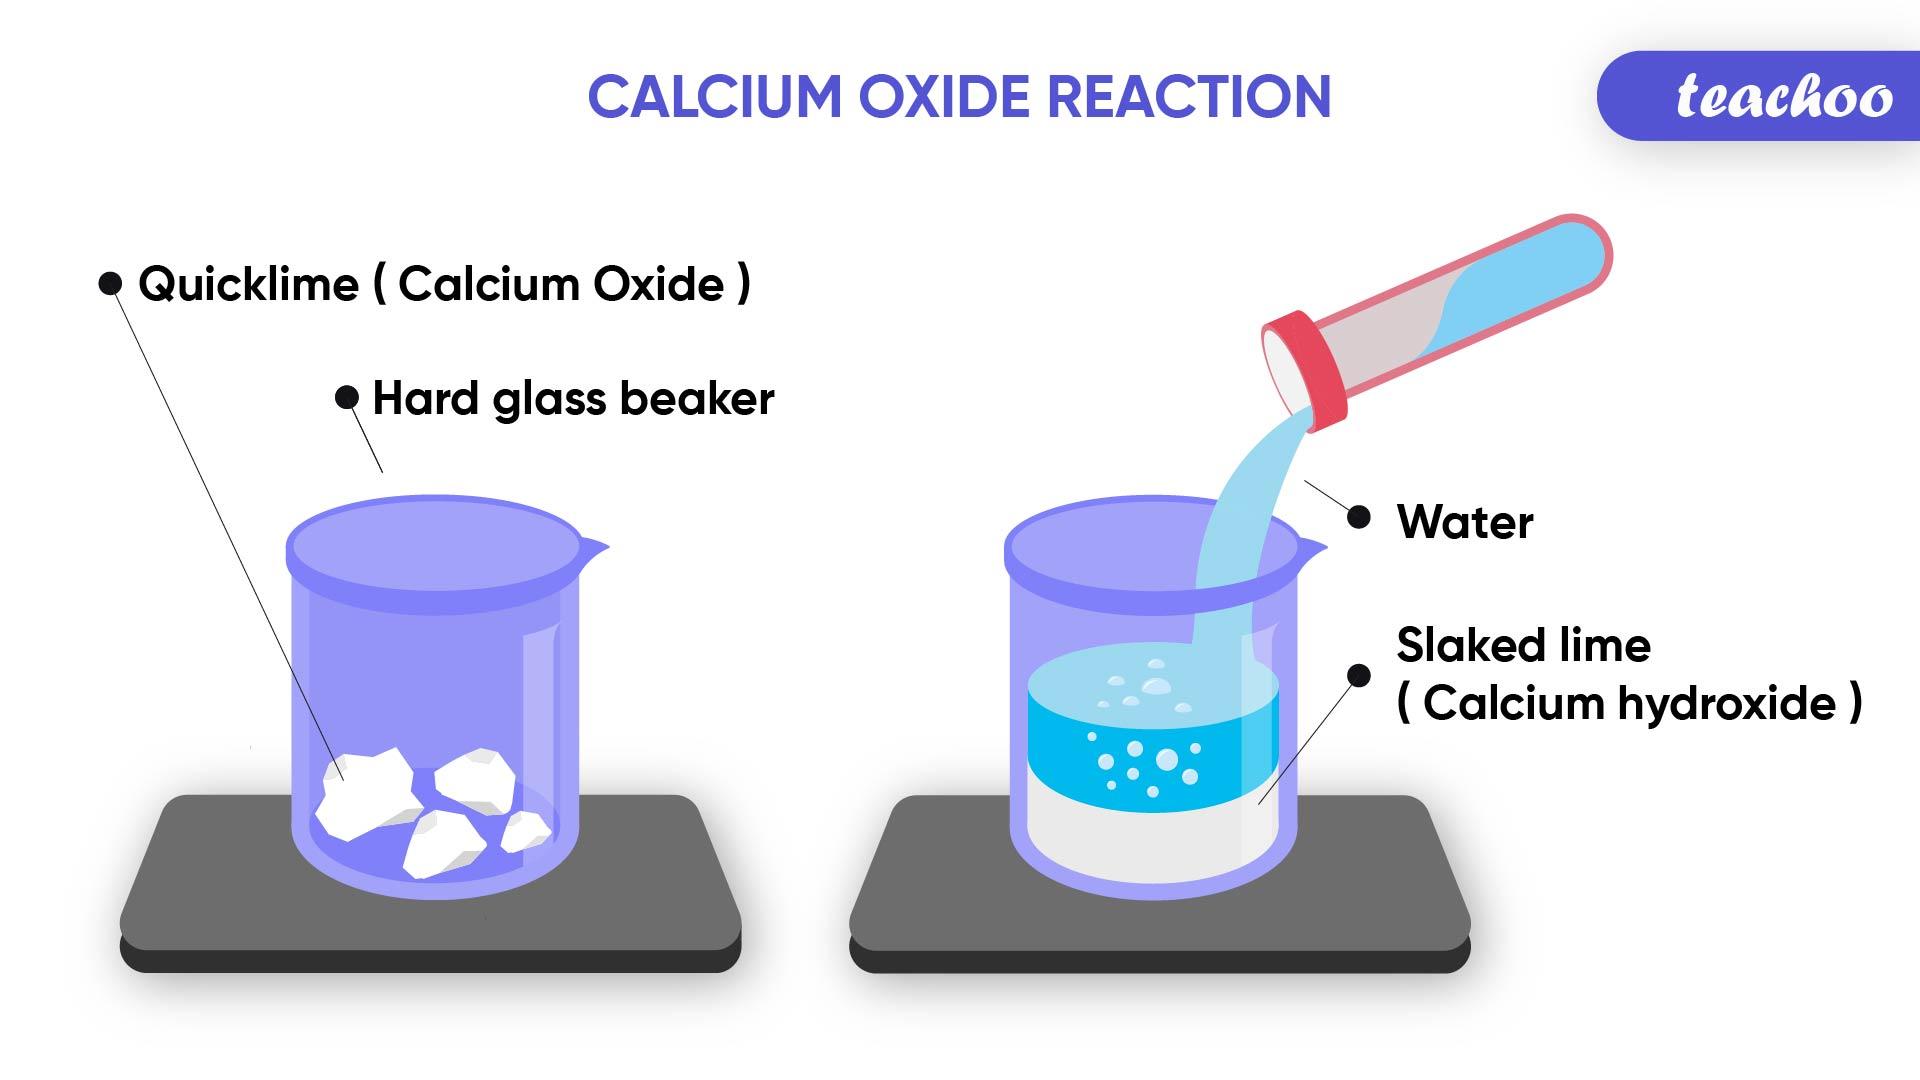 Calcium Oxide Reaction-Teachoo-01.jpg